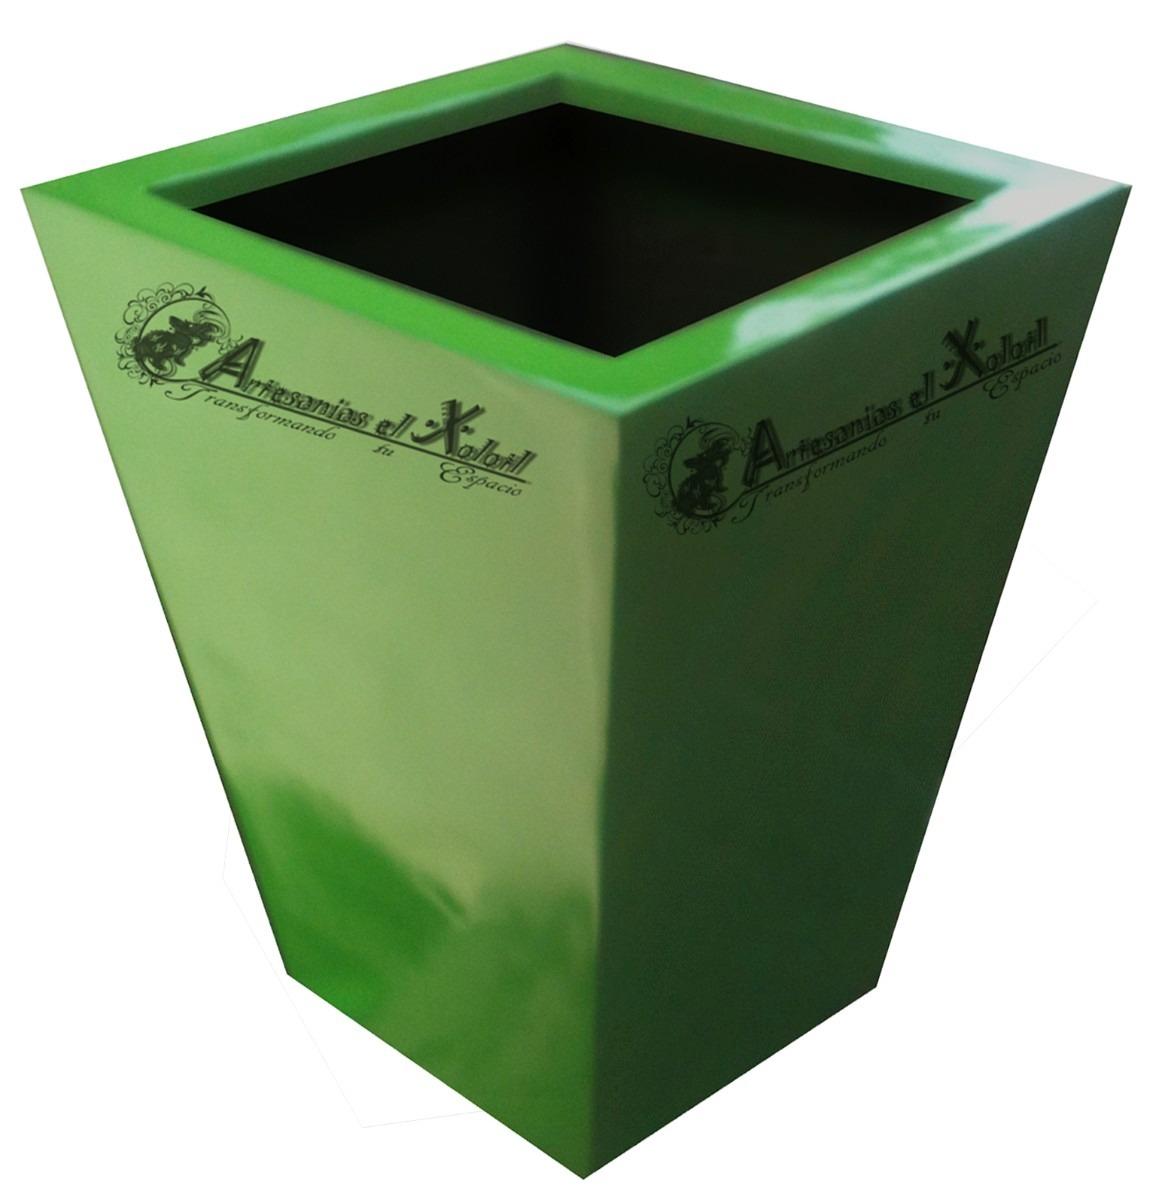 Macetas fibra de vidrio obelisco minimalista jardineras - Plastico para jardineras de madera ...